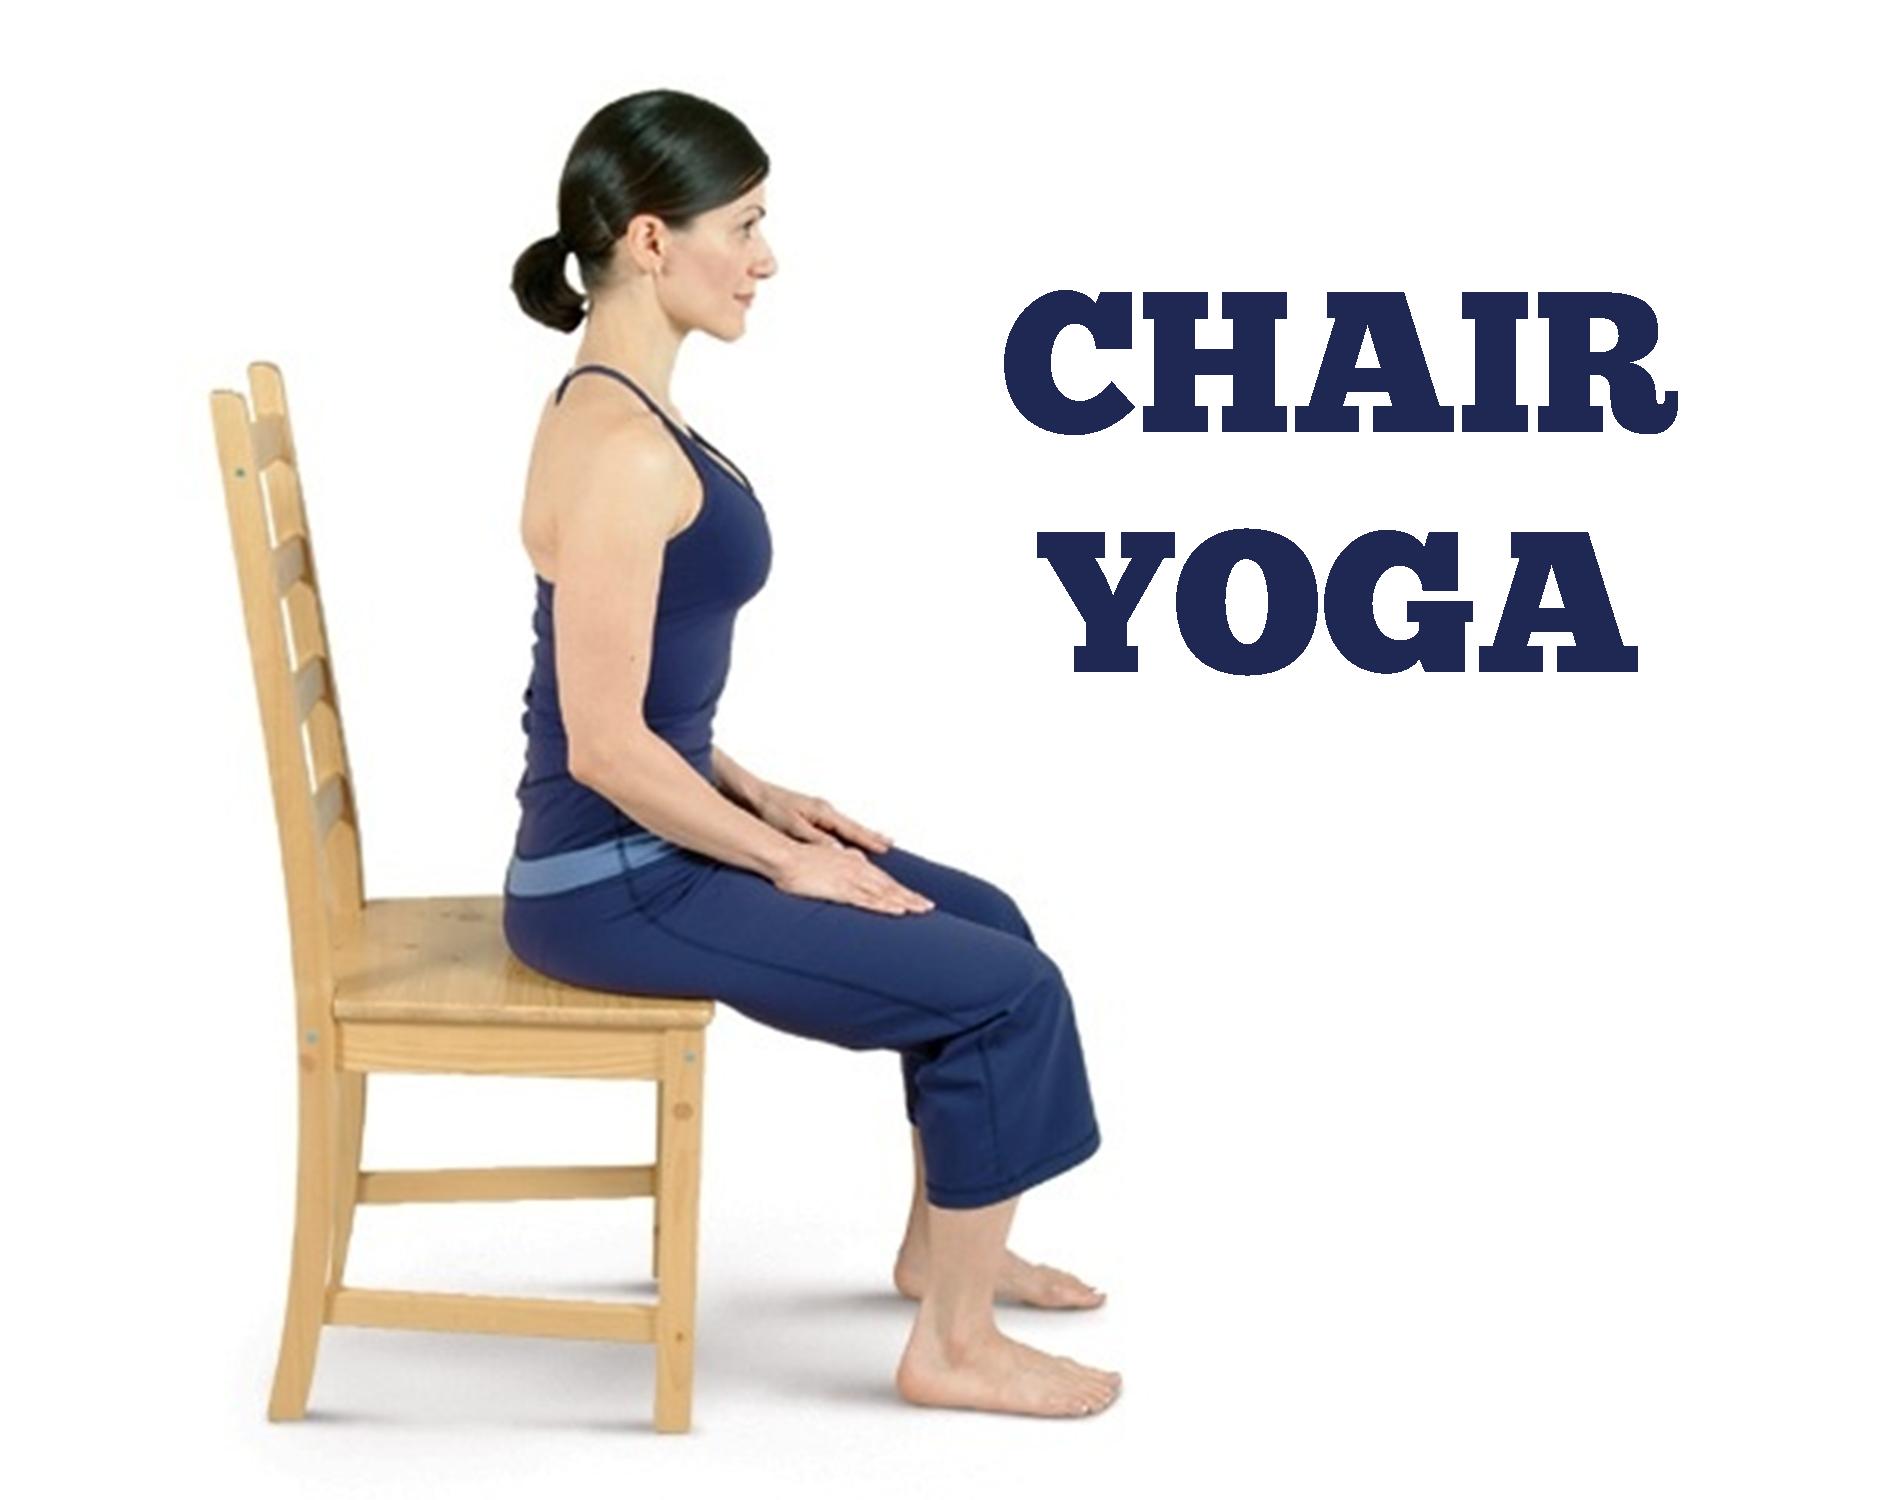 Chair Yoga @ 10:30 - Yoga Breathing PNG